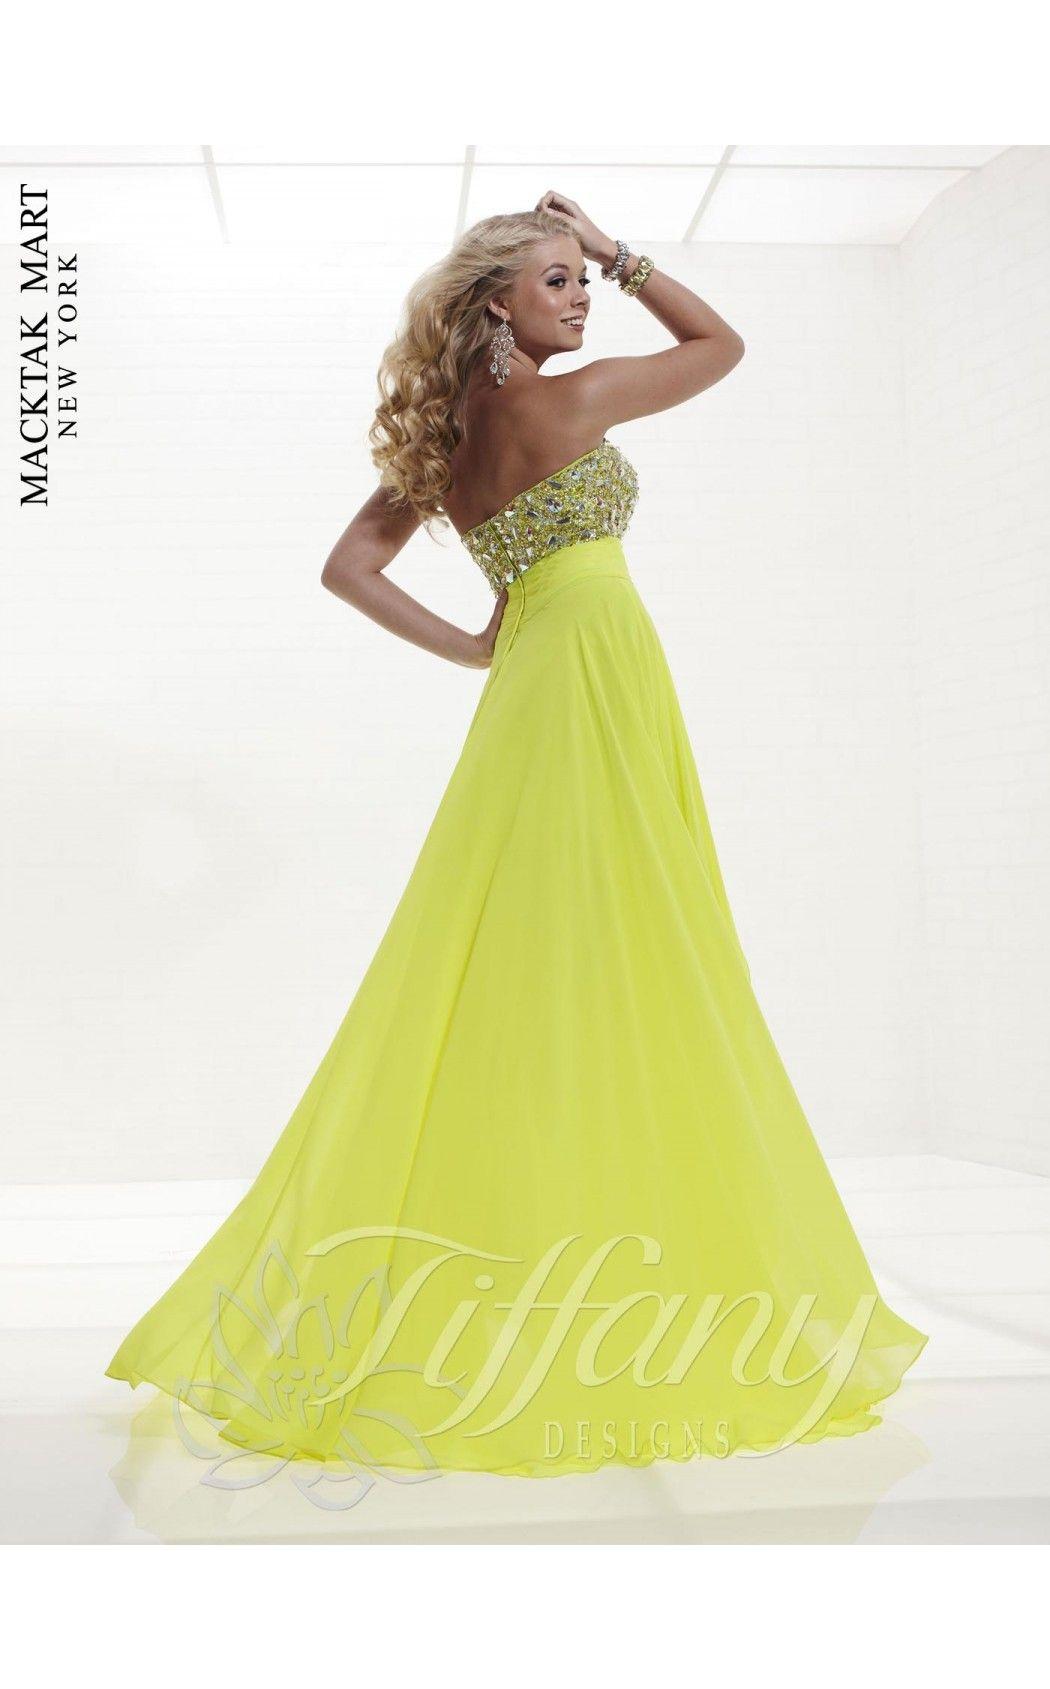 Tiffany 16775 neon color dress #green #lemon #strapless #long #prom ...